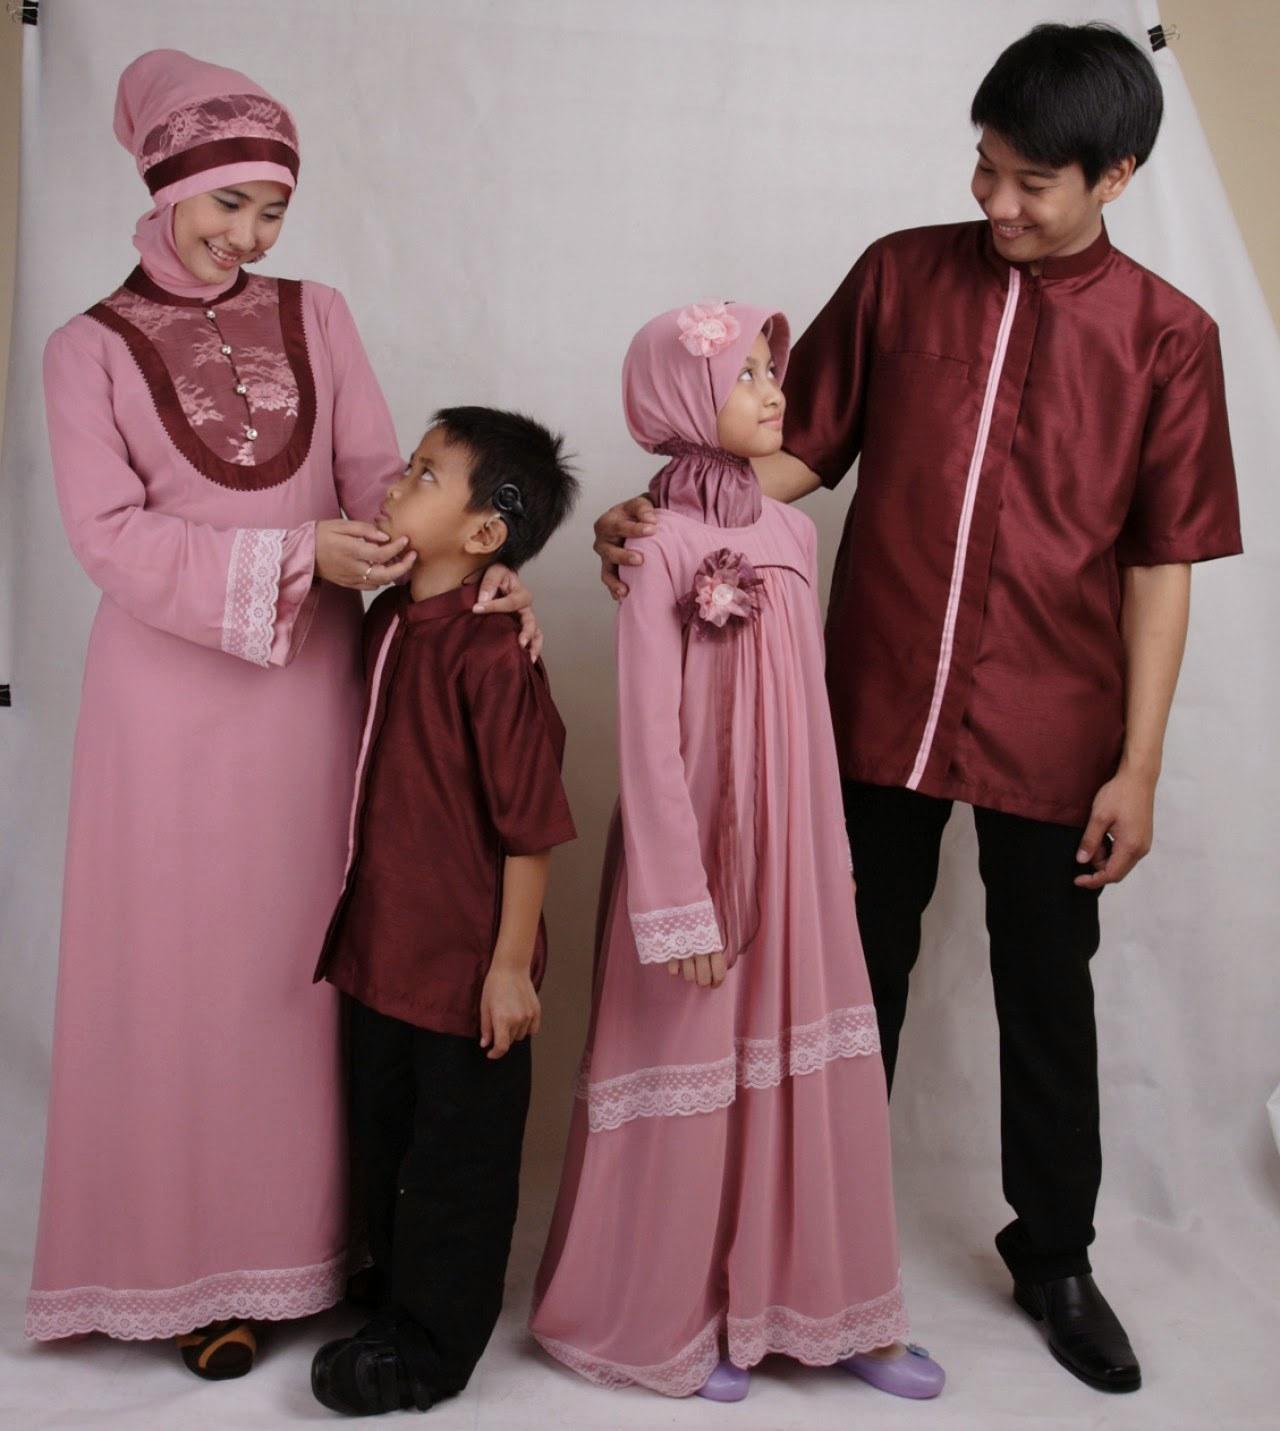 Inspirasi Baju Lebaran Kembar Keluarga D0dg Model Baju Keluarga Muslim Seragam Kembar Terbaru 2018